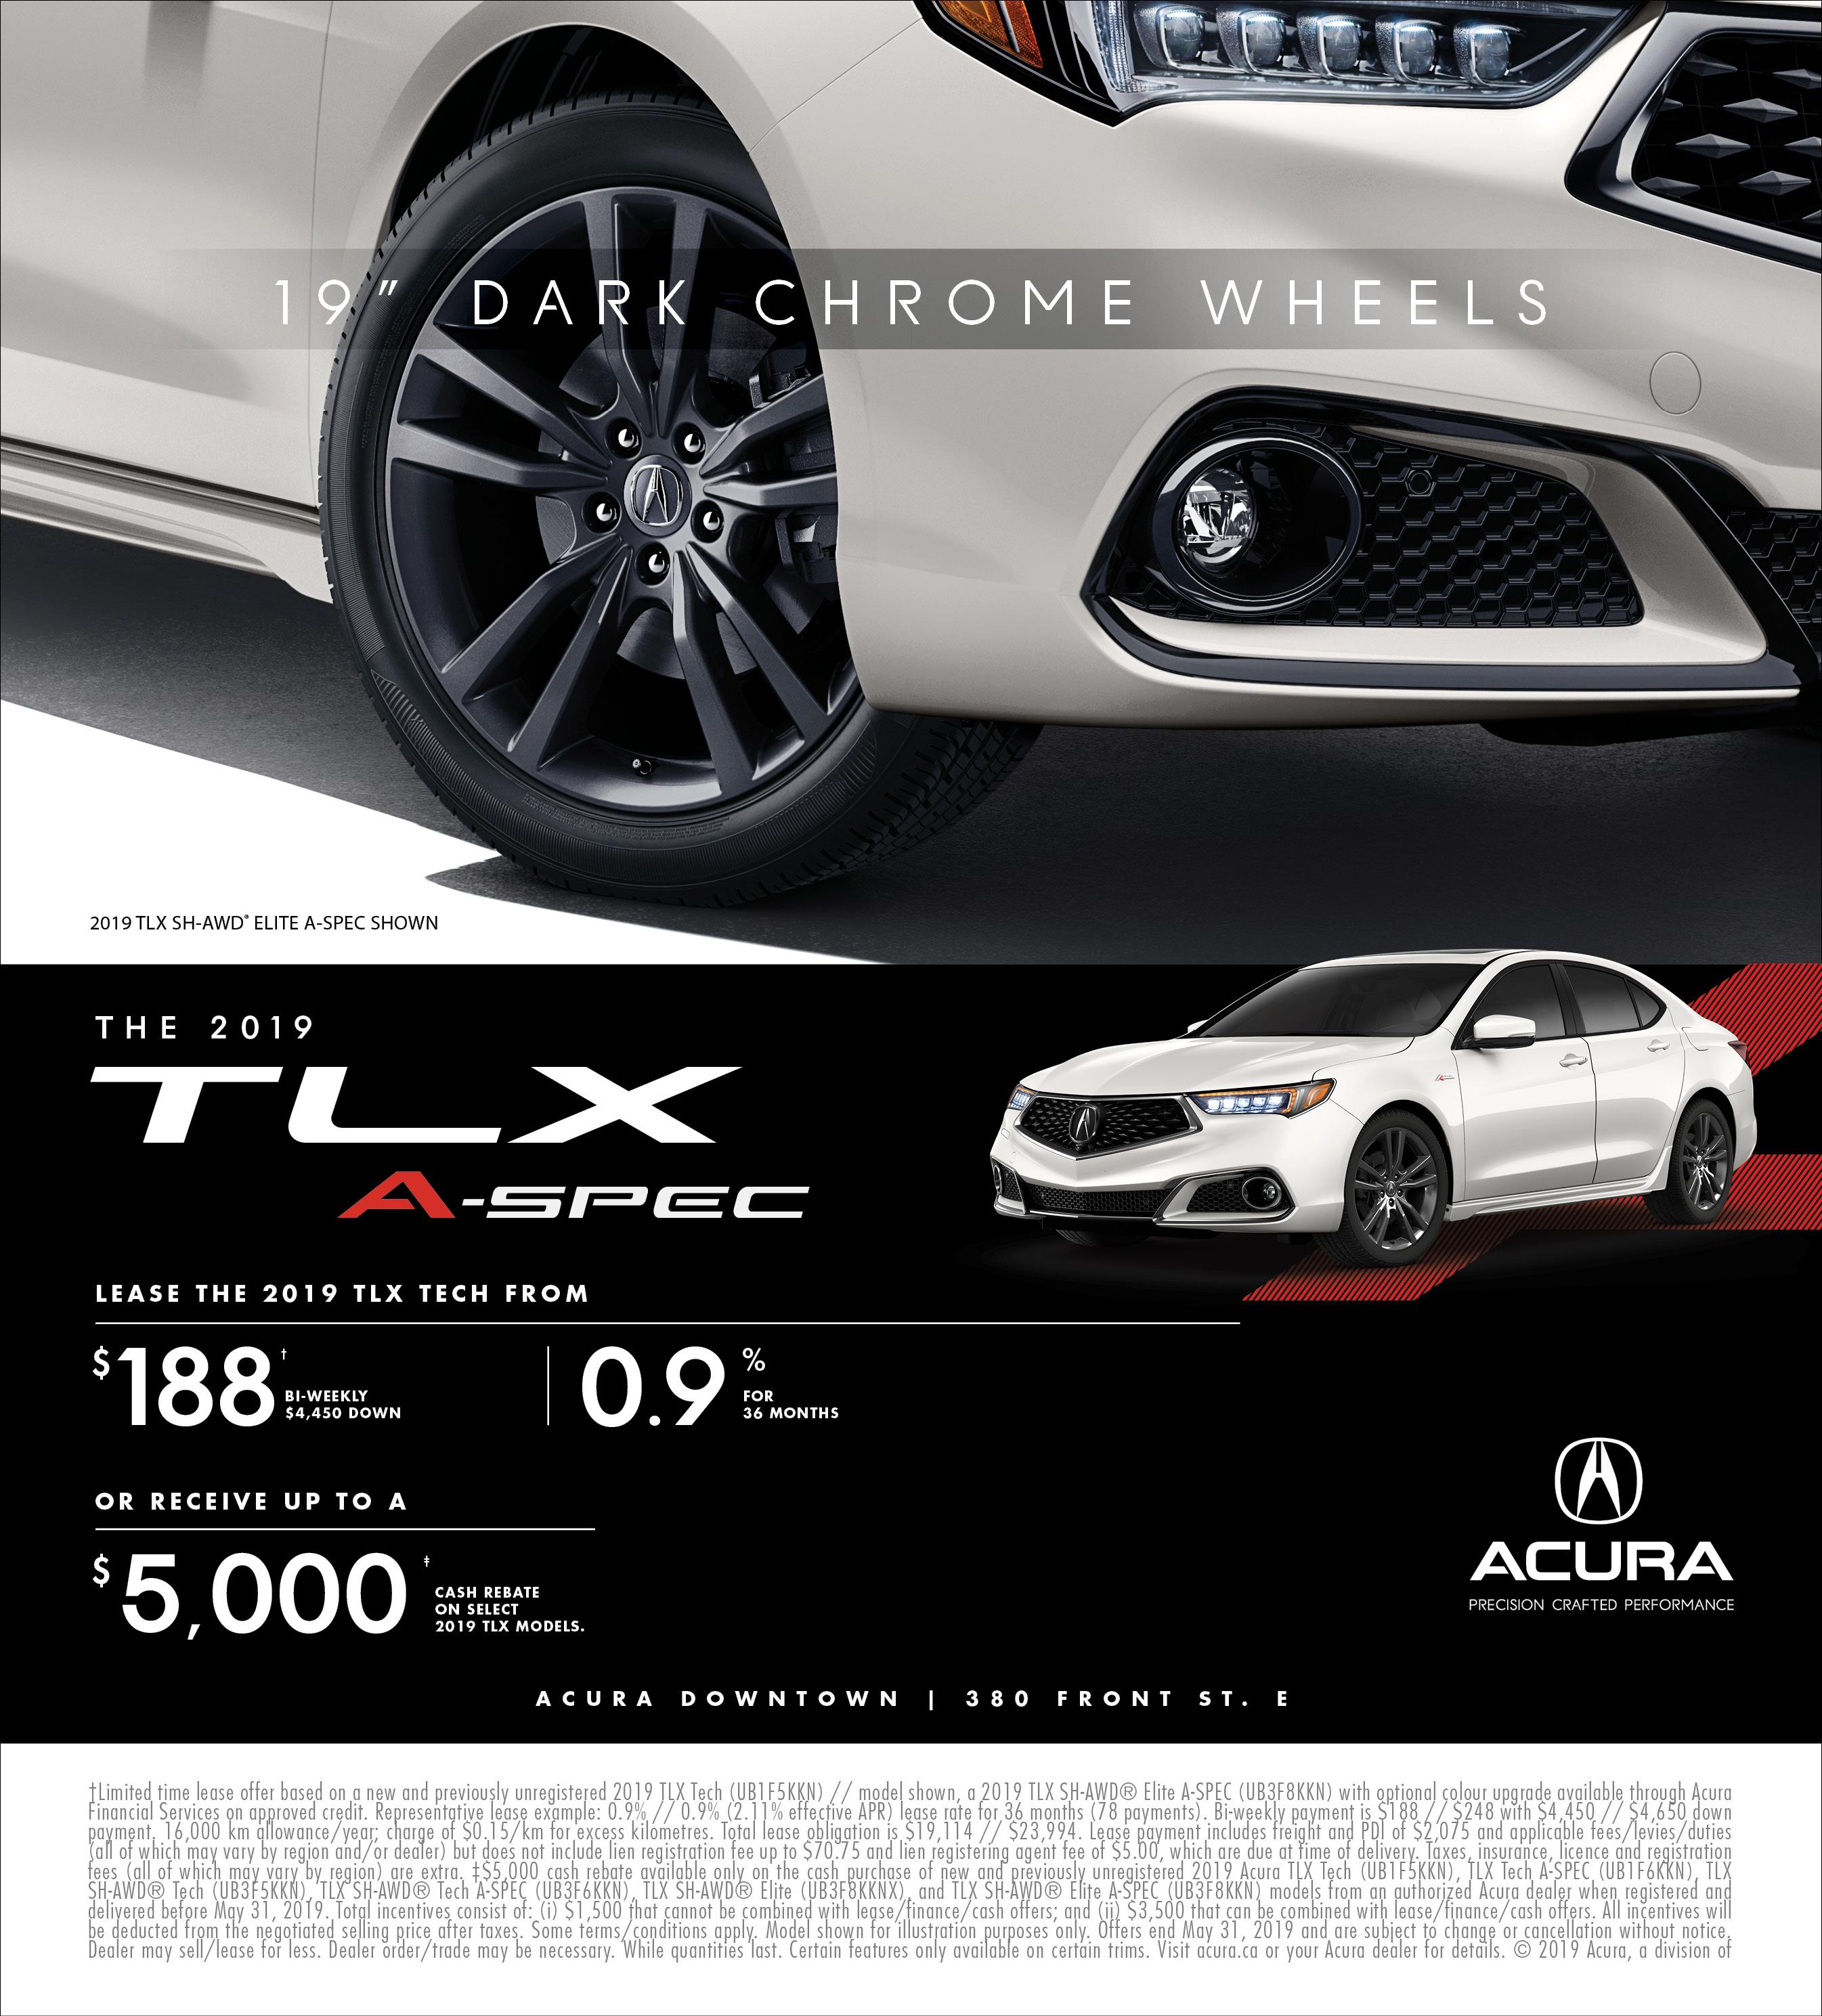 2019 Acura TLX   May